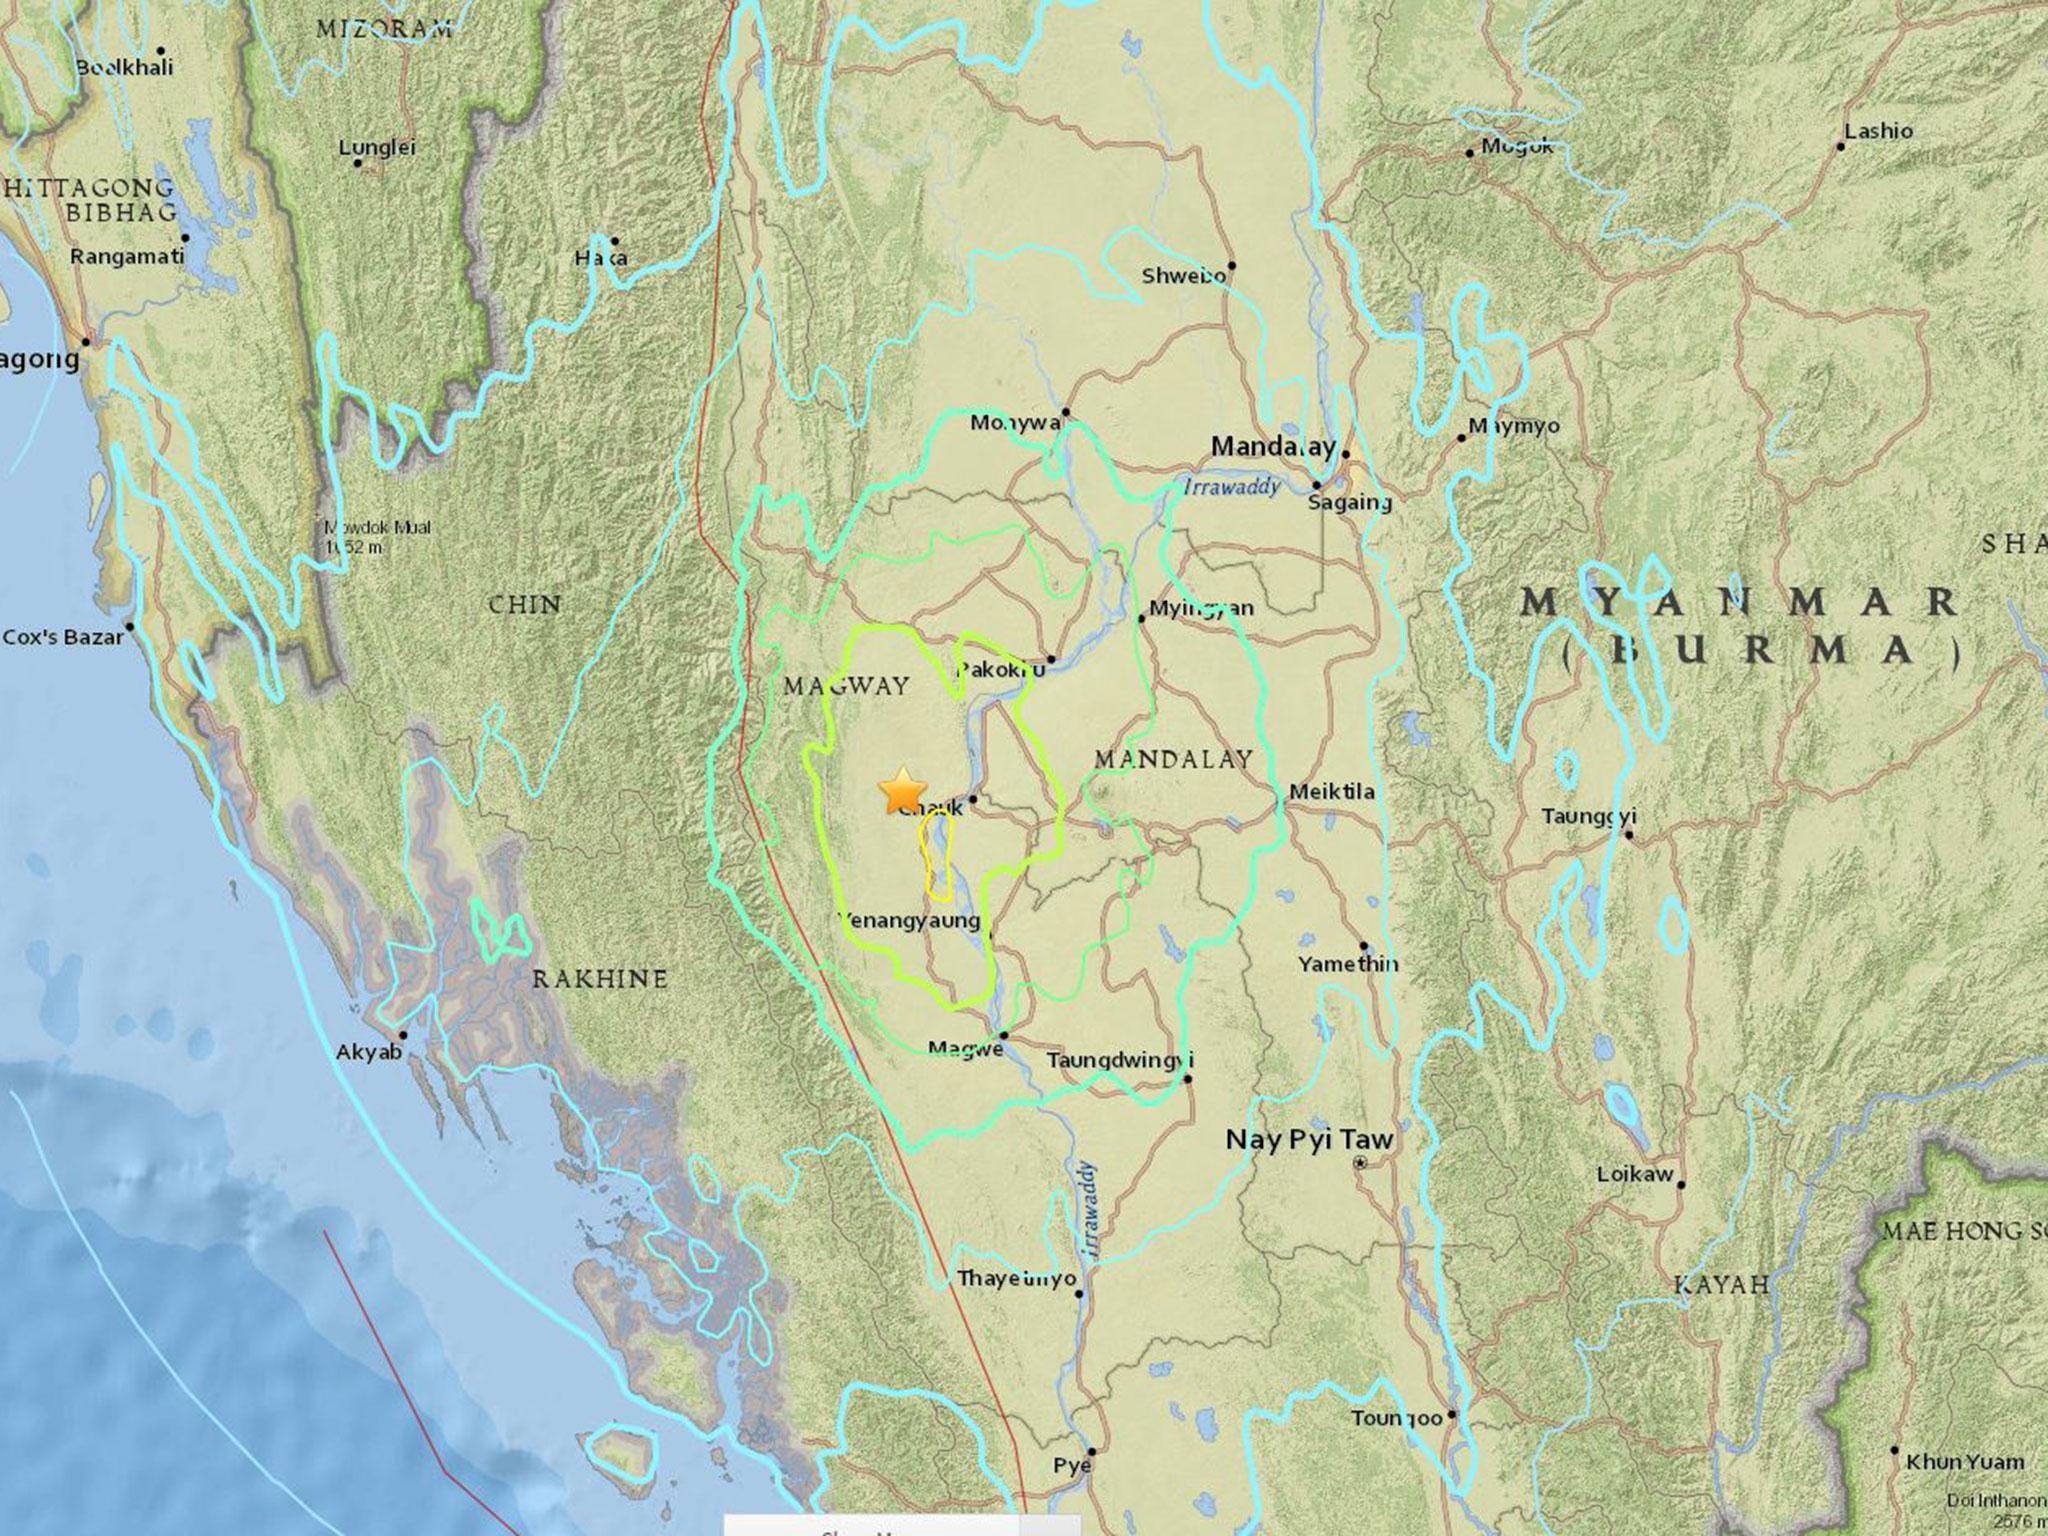 Burma earthquake: 6.8 magnitude quake strikes in centre of country